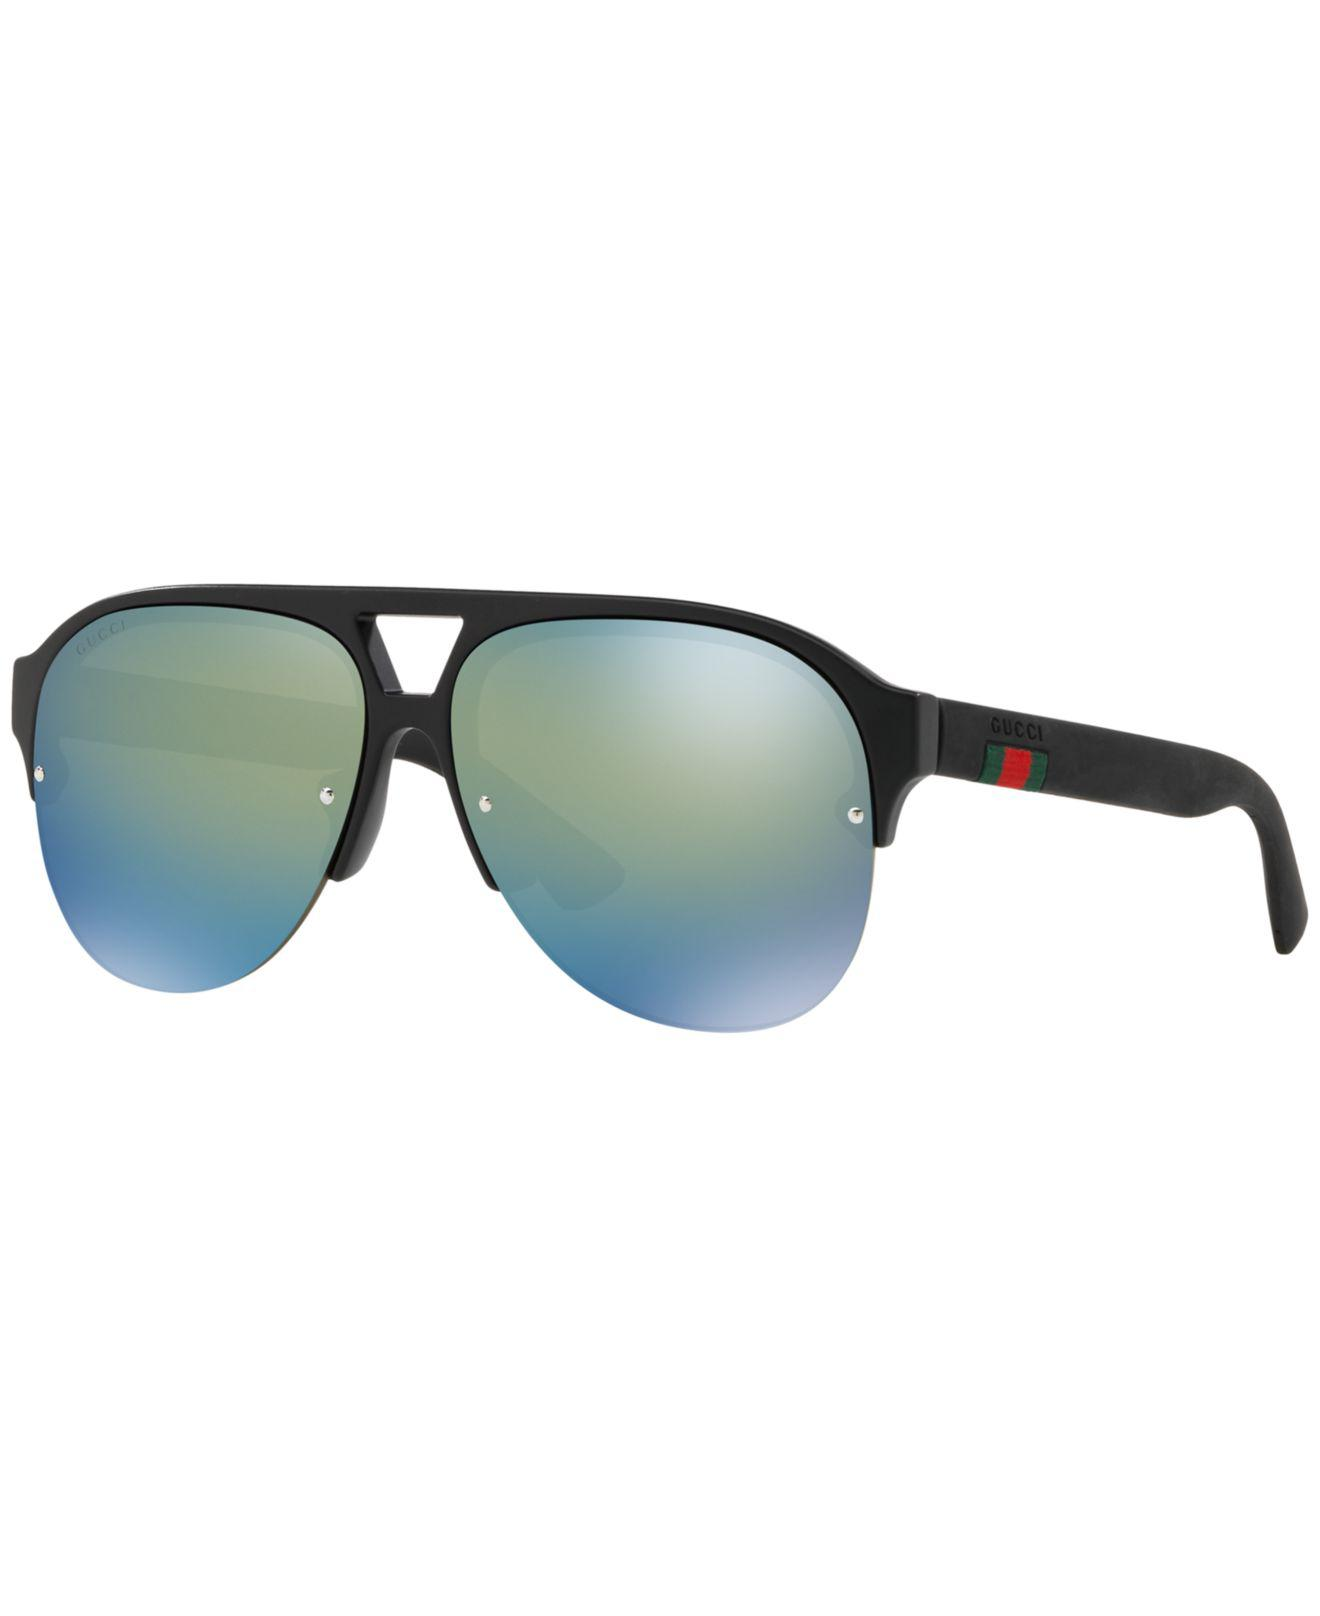 defe50d143 Gucci 0170 s Aviator Sunglasses for Men - Lyst